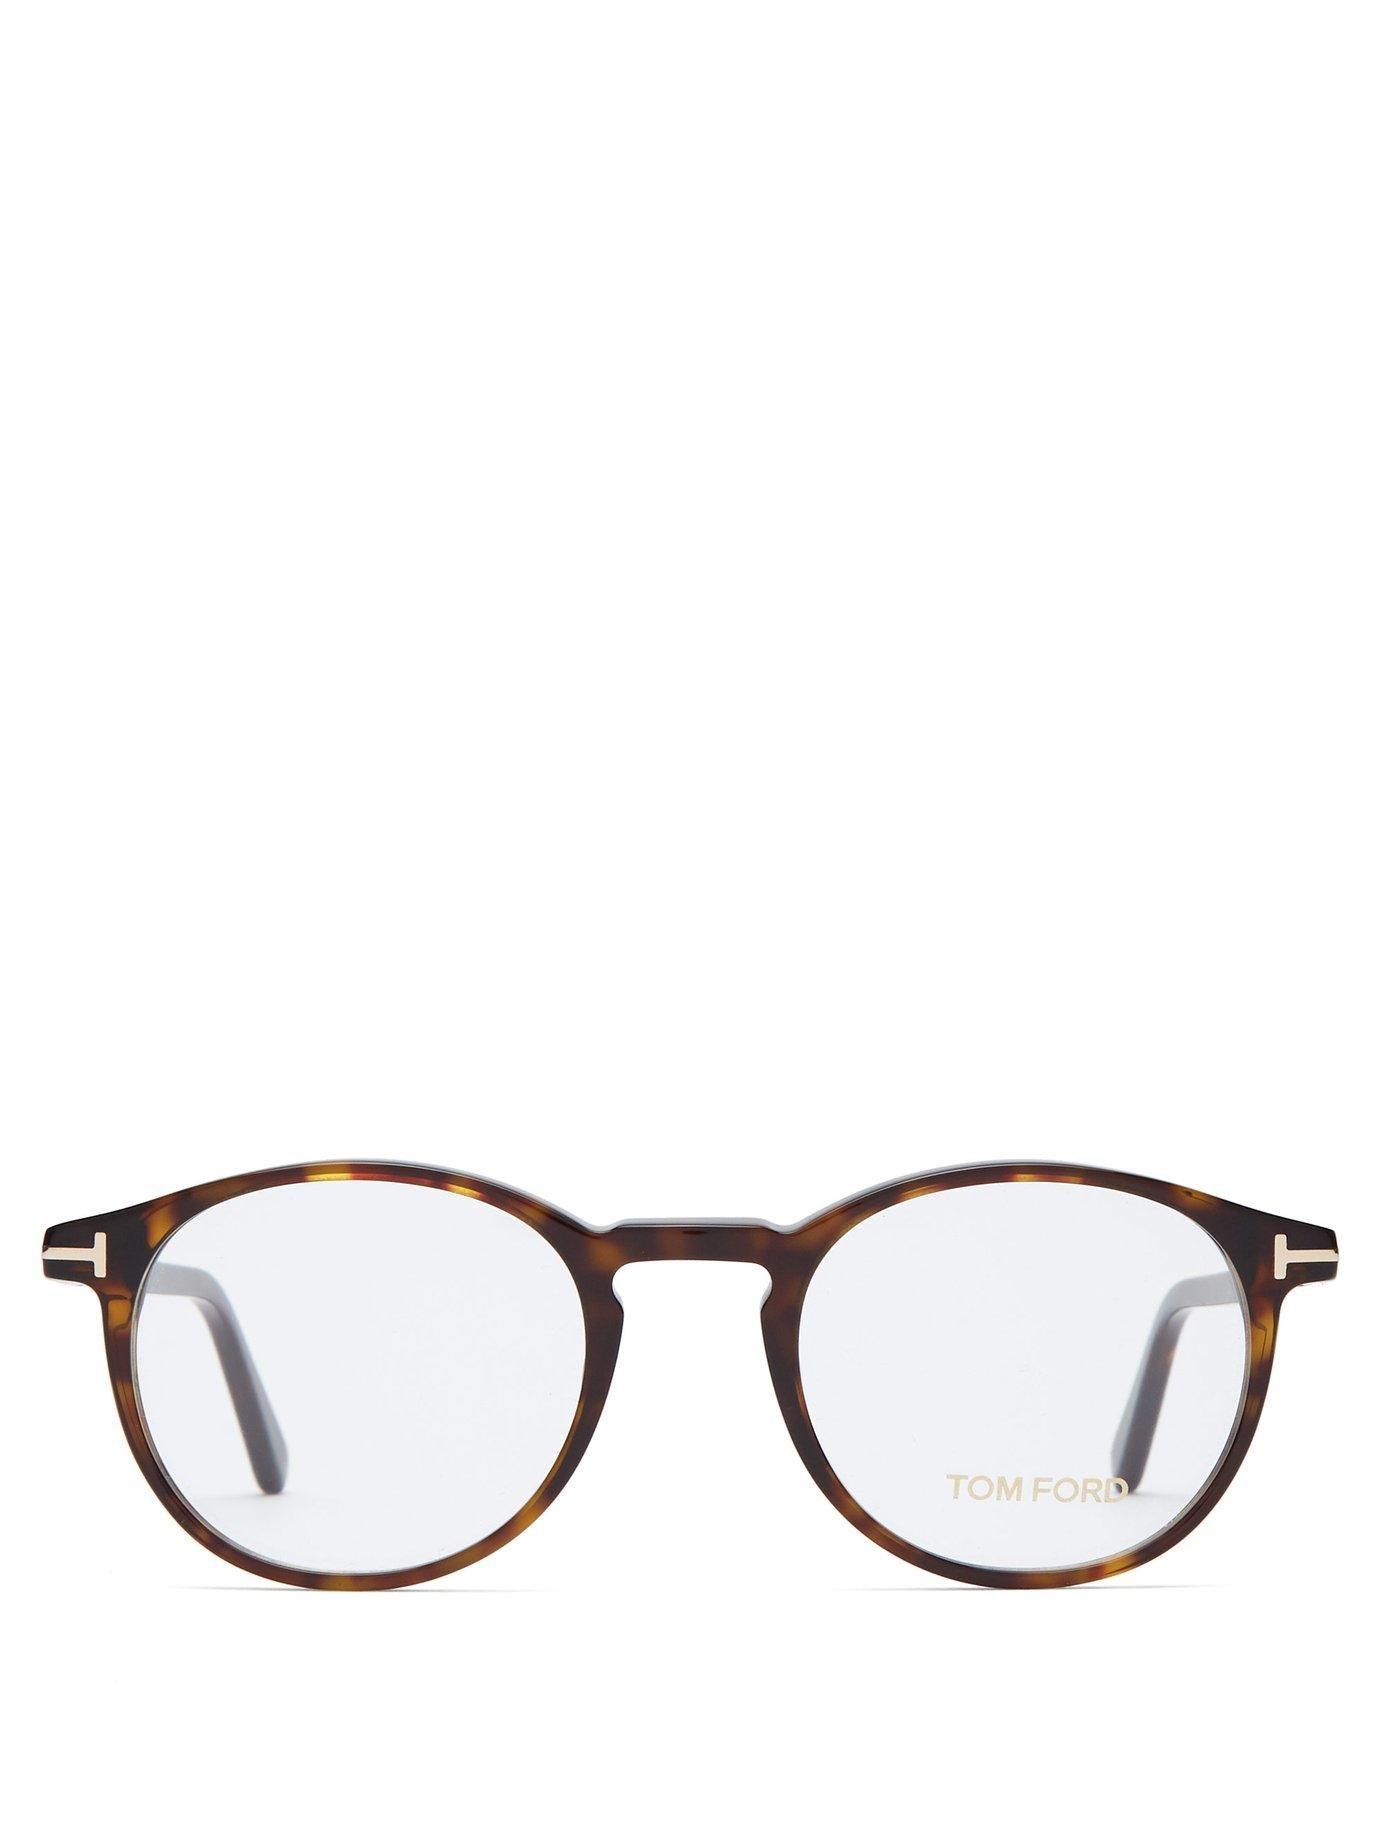 677d6a7dd4a Tom Ford - Brown Tortoiseshell Round Frame Glasses for Men - Lyst. View  fullscreen